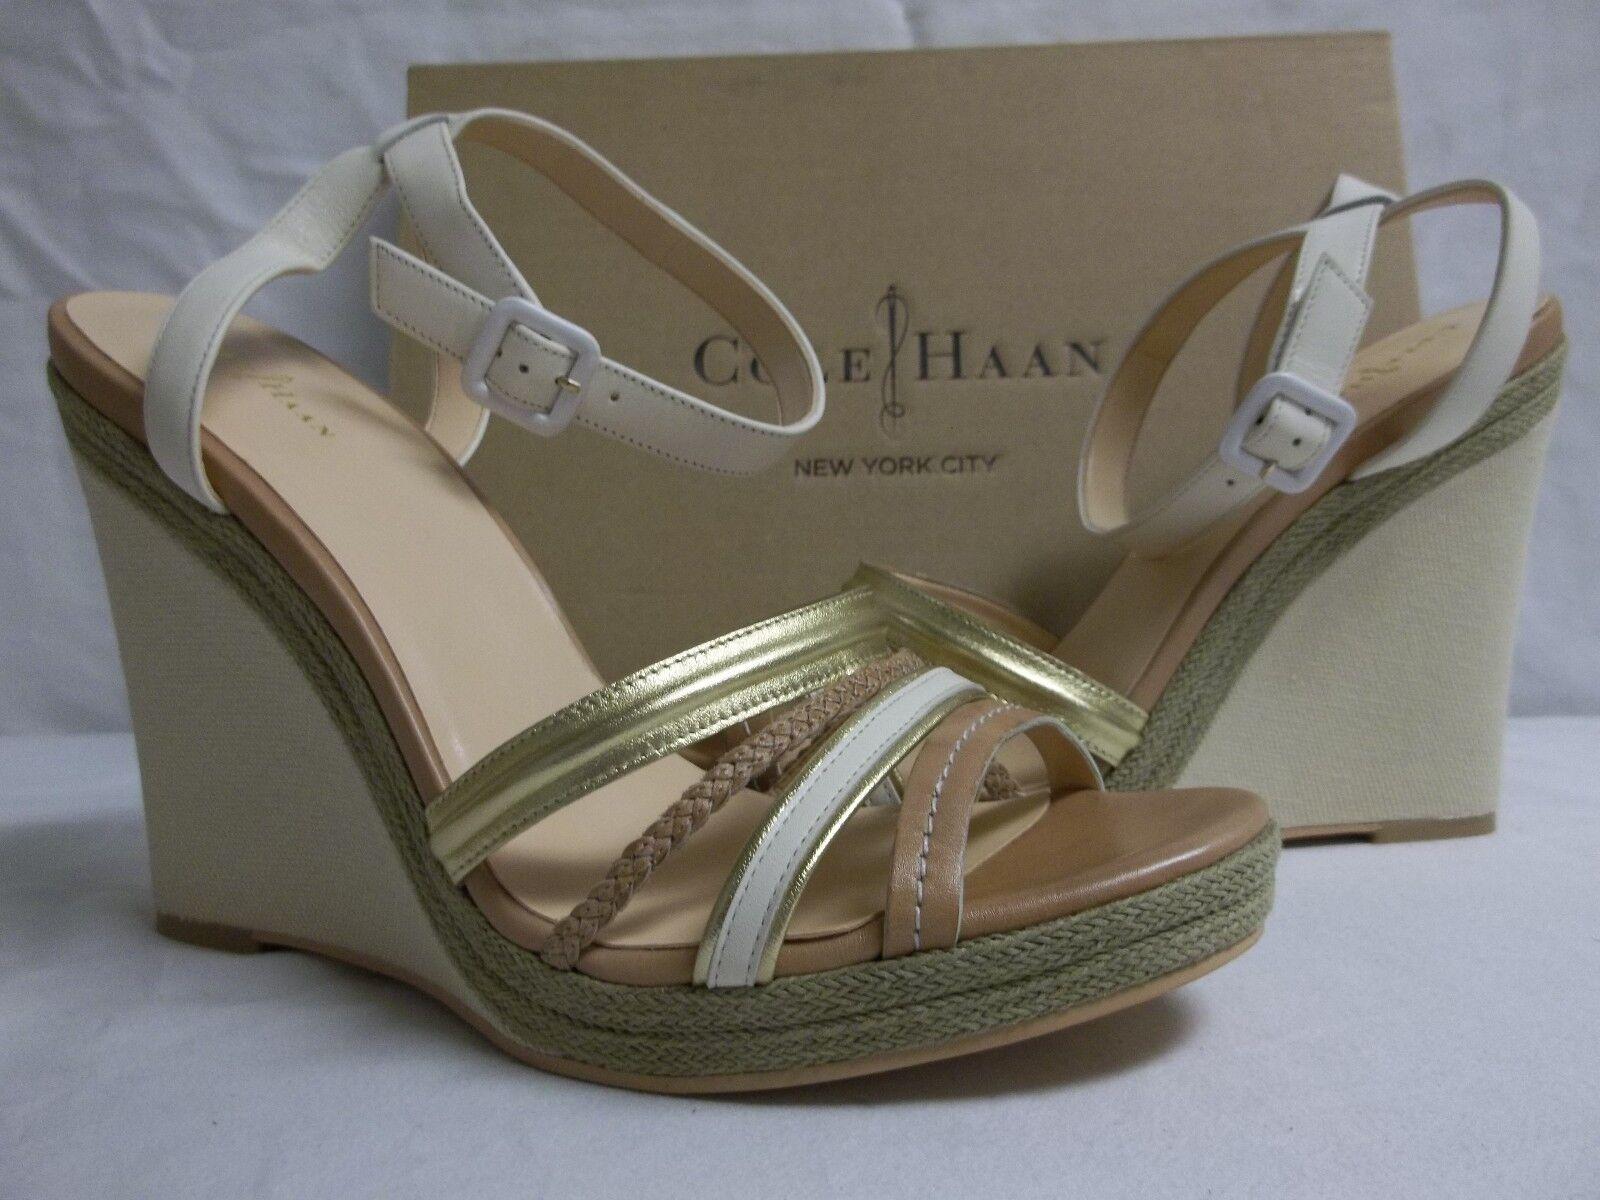 Cole Haan 11 M Nassau Pelle Ivory Sandstone Open Toe Wedges New Donna Shoes